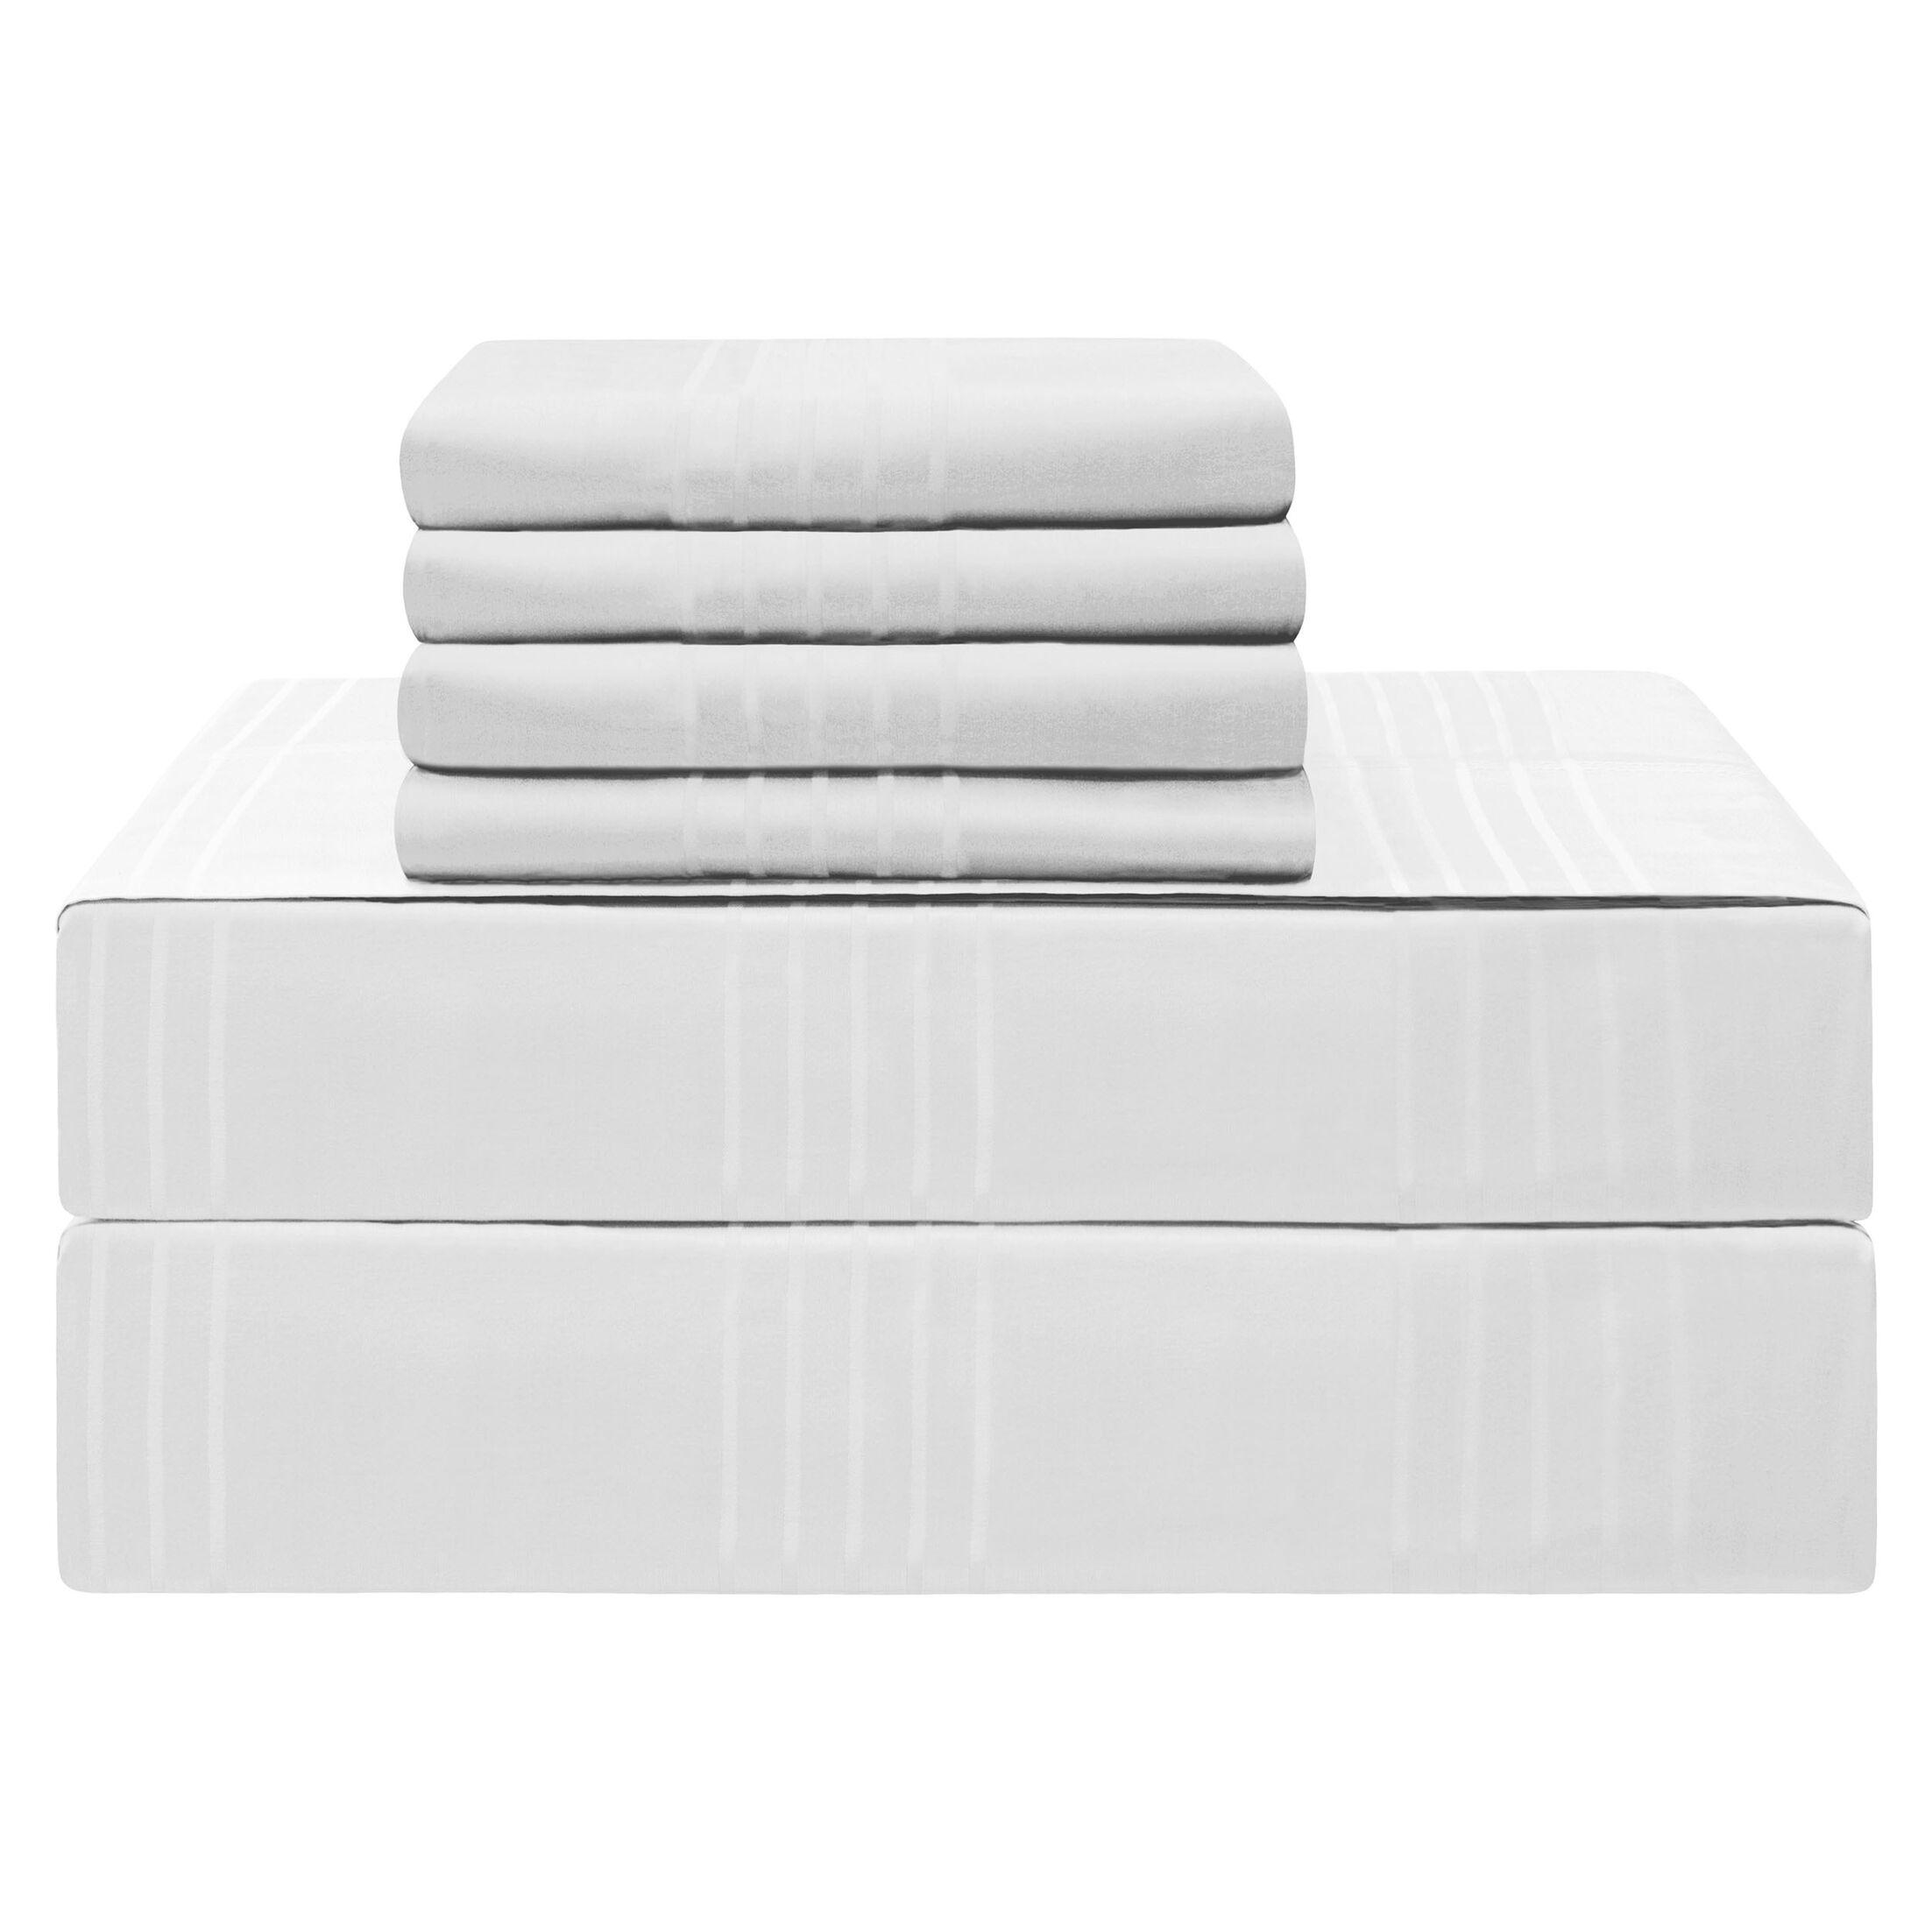 Gerardo Premium 420 Thread Count 100% Cotton Sheet Set Size: California King, Color: White